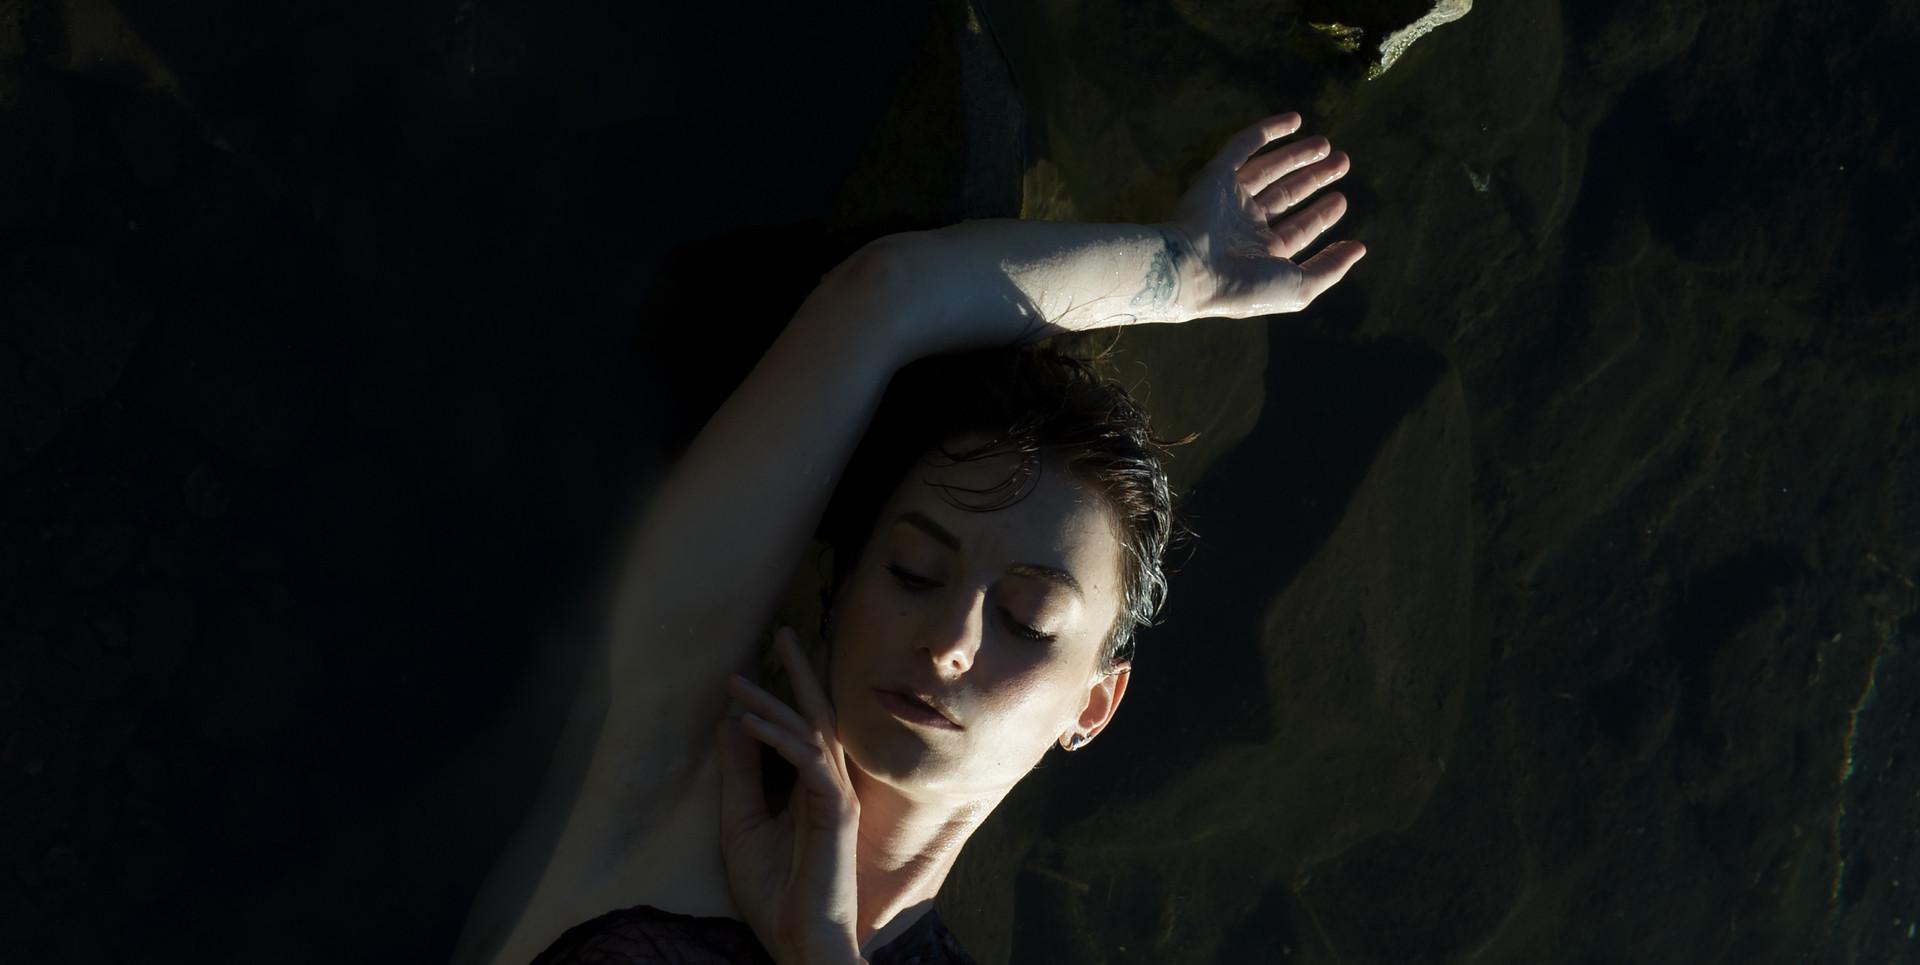 Irene Fittipaldi